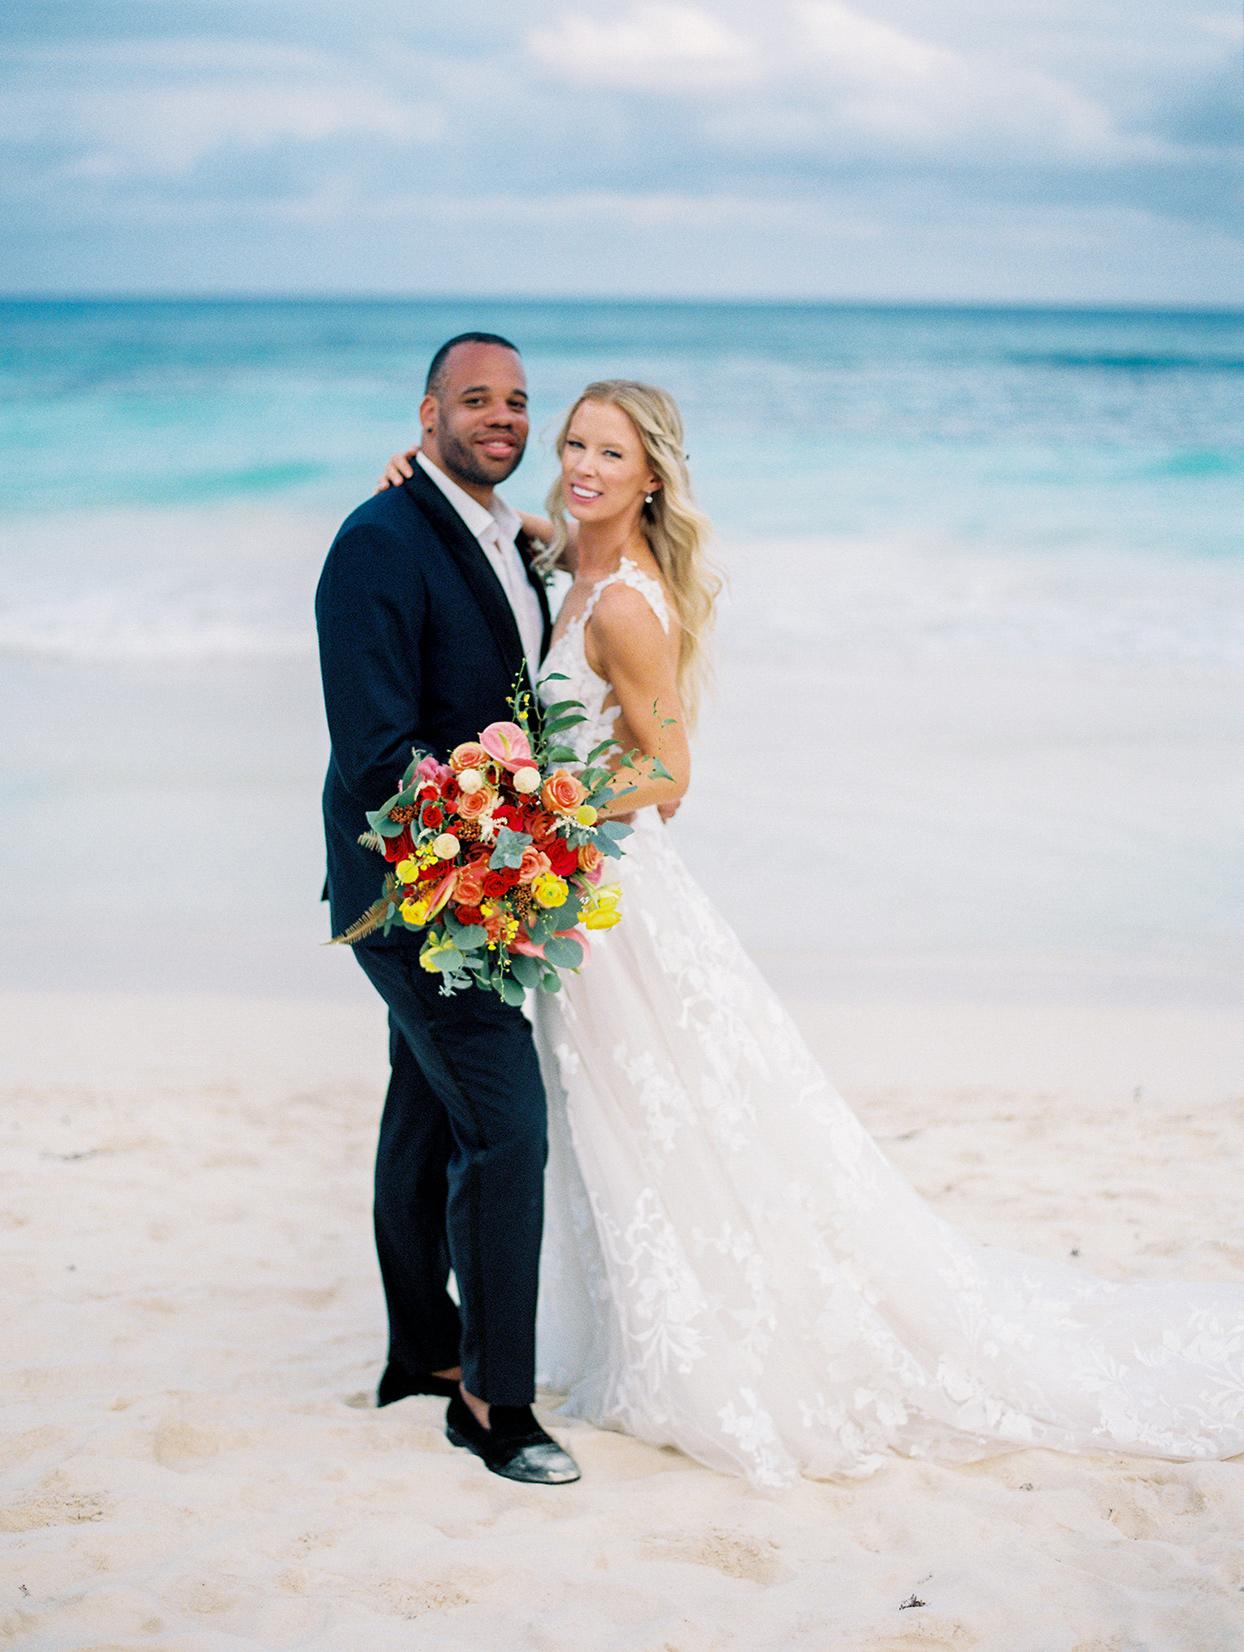 wedding couple posing for portrait on the beach